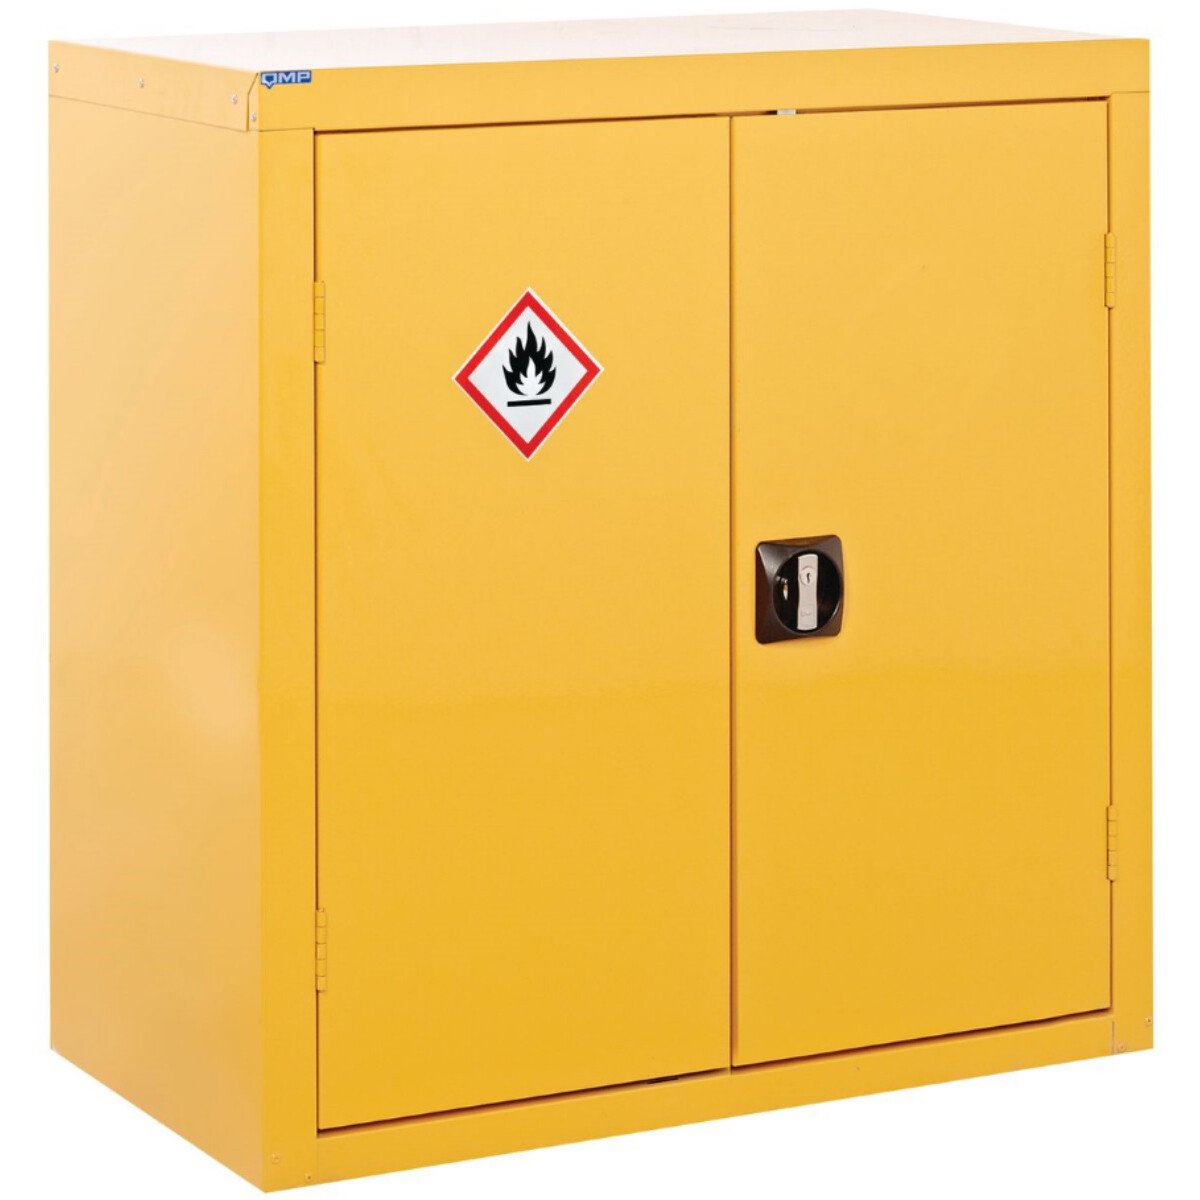 QMP CZ909046 Hazardous Substance Cupboard 900 x 900 x 460mm